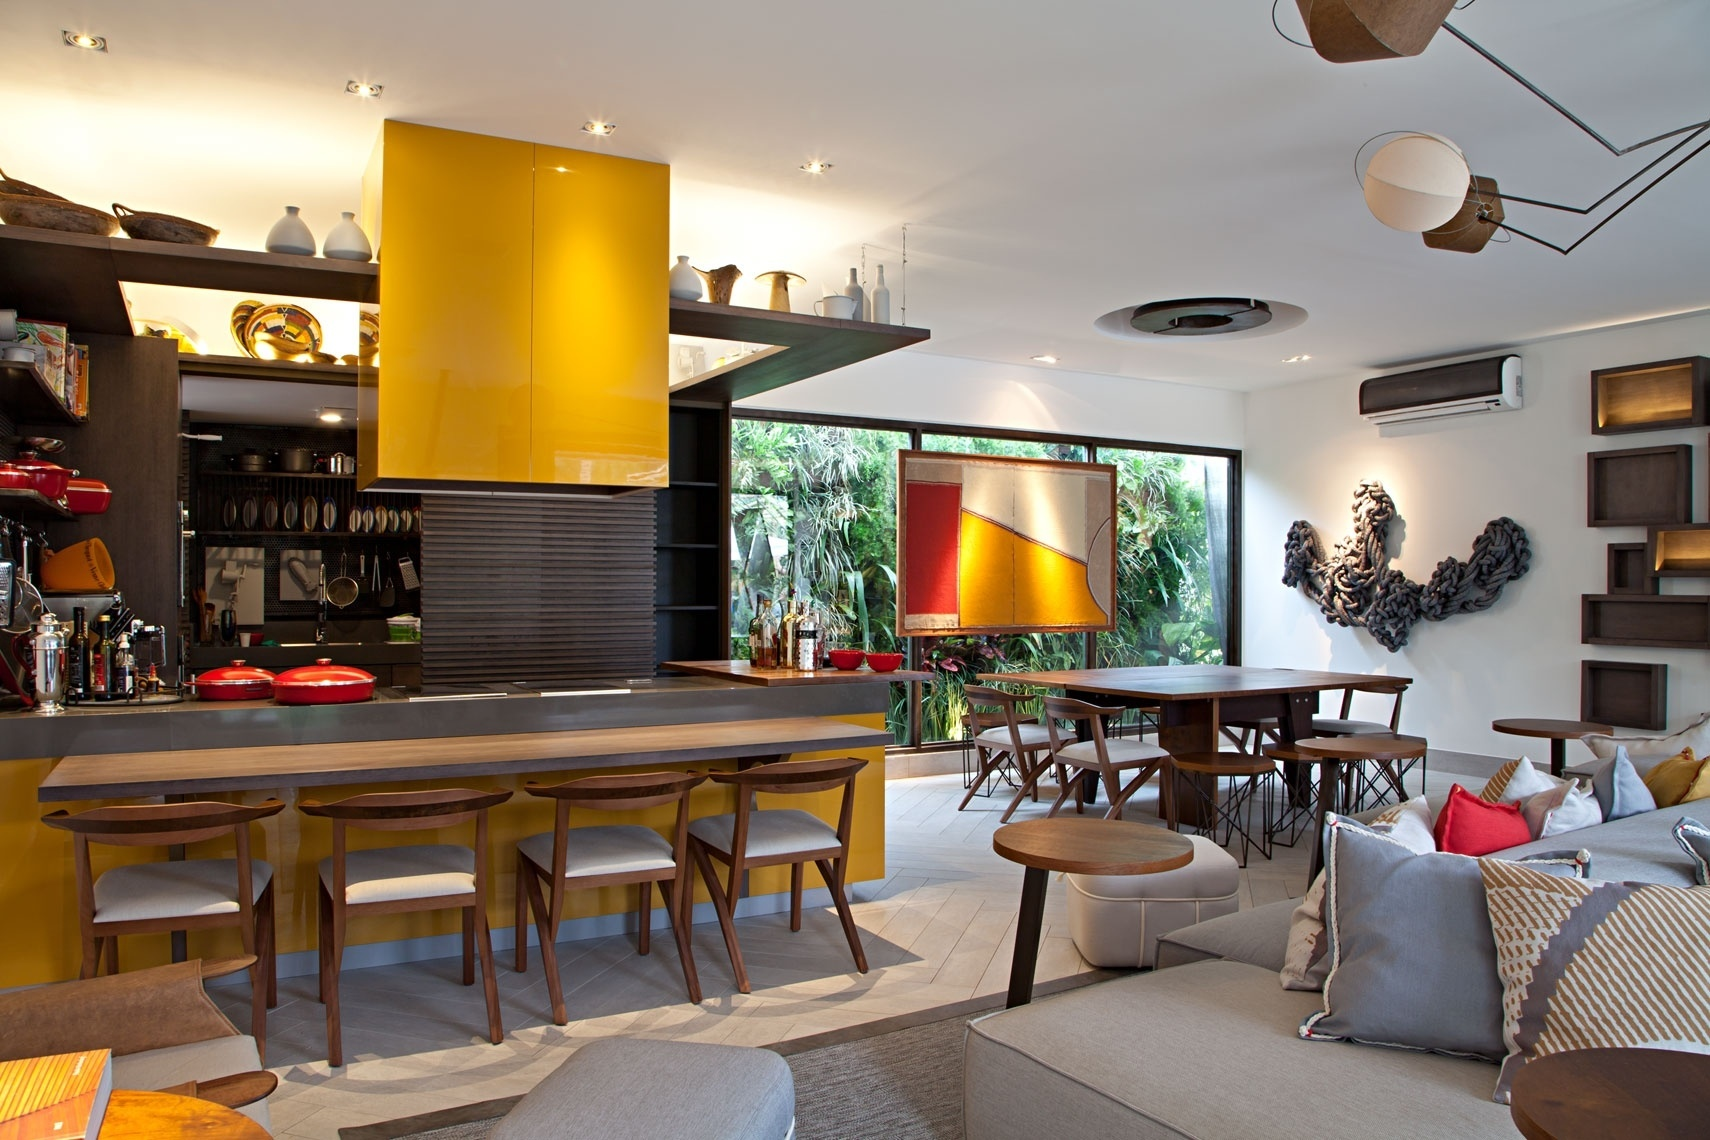 Cozinha Decorada Com Ilha Na Cor Branca Pictures to pin on Pinterest #C59606 1710 1140